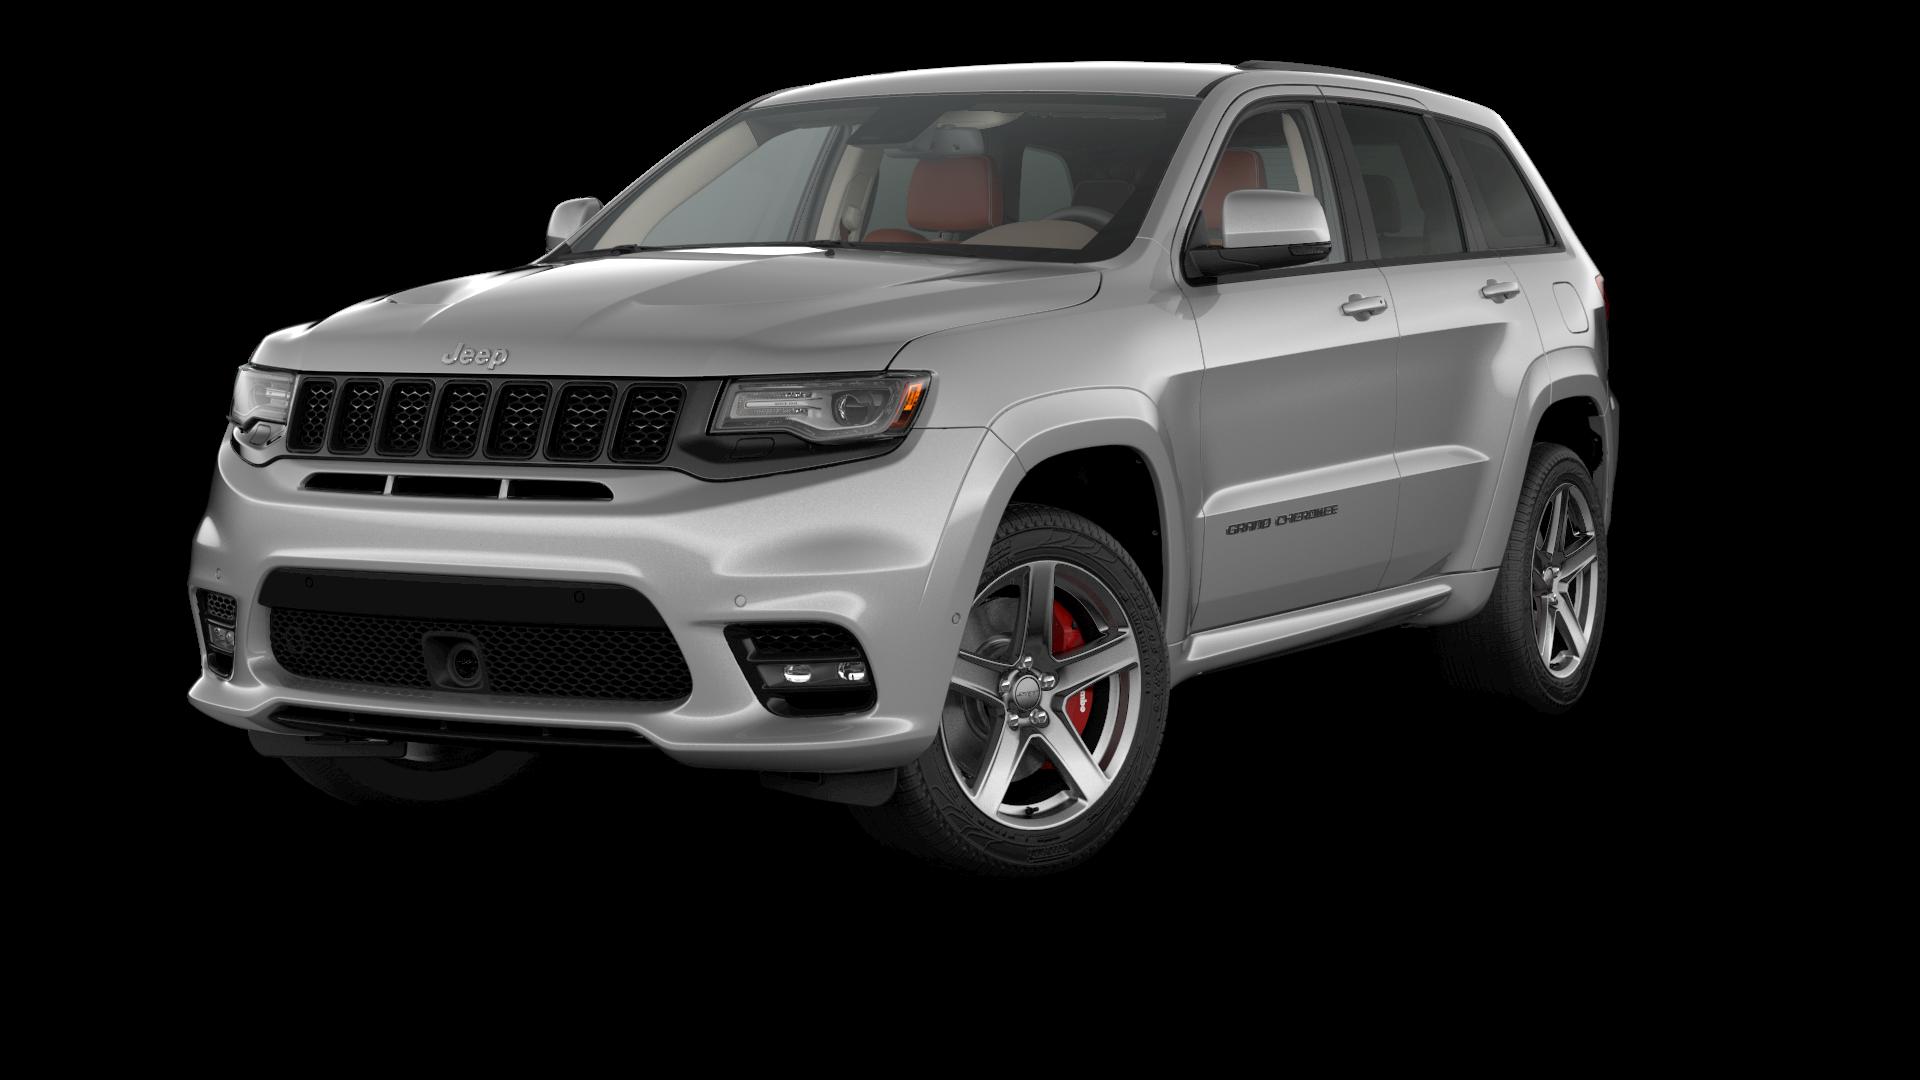 Jeep Grand Cherokee Srt Luxury Performance Suv Jeep Grand